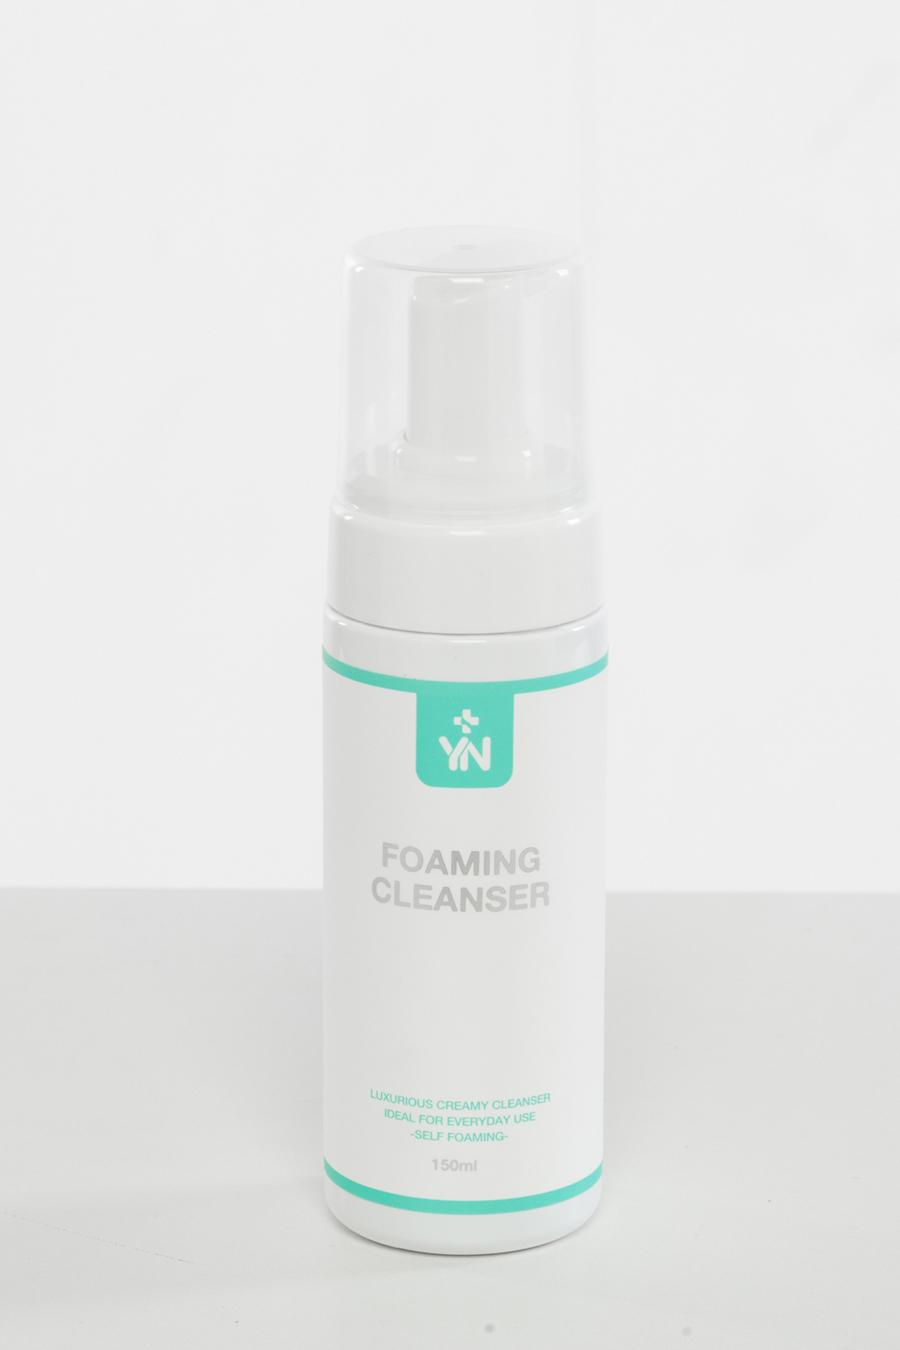 Sữa rửa mặt tốt nhất YN Miraheal Foaming Cleanser